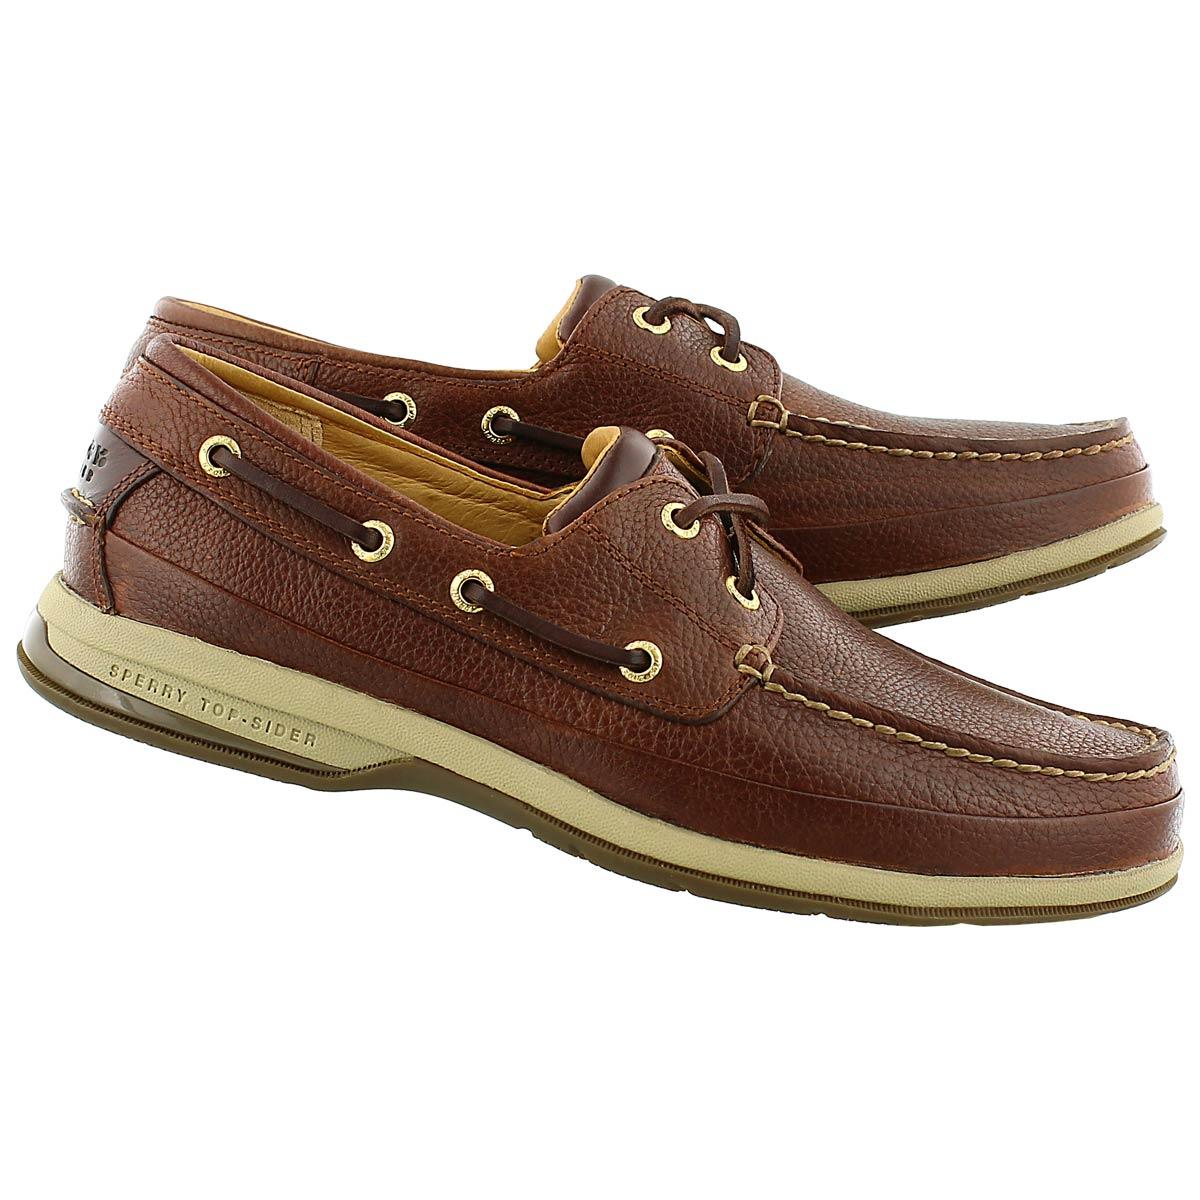 Mns Gold Boat W/ ASV cognac boat shoe